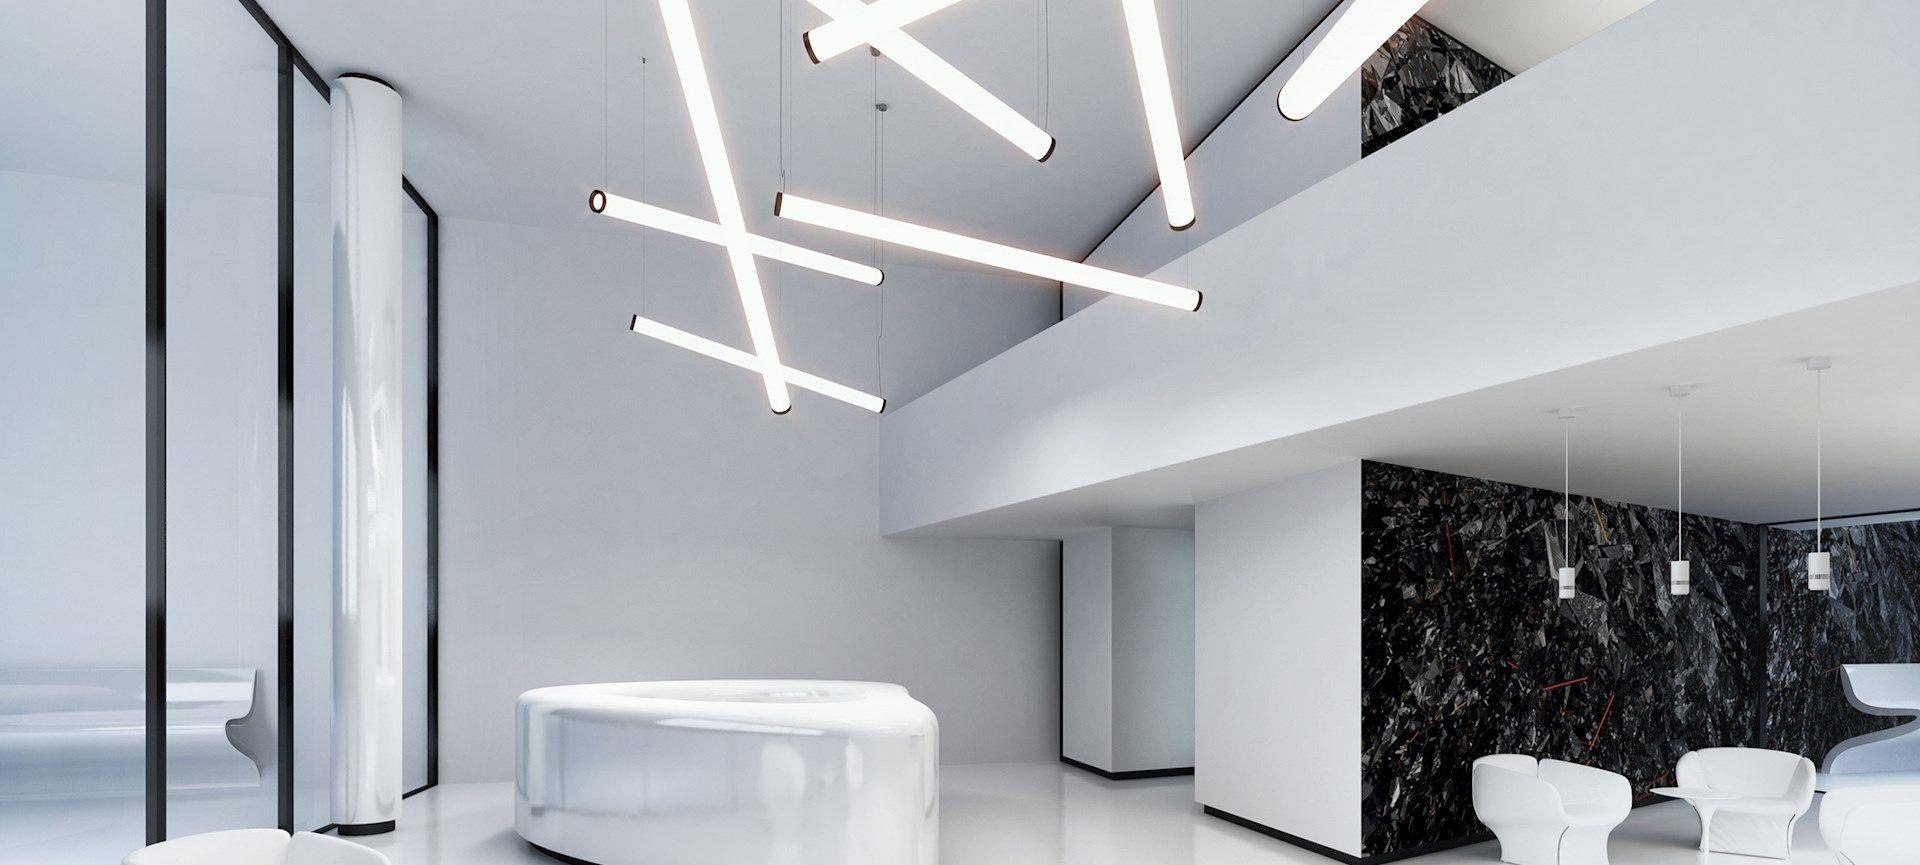 Suspended tubular lighting reception pinterest suspended tubular lighting arubaitofo Gallery